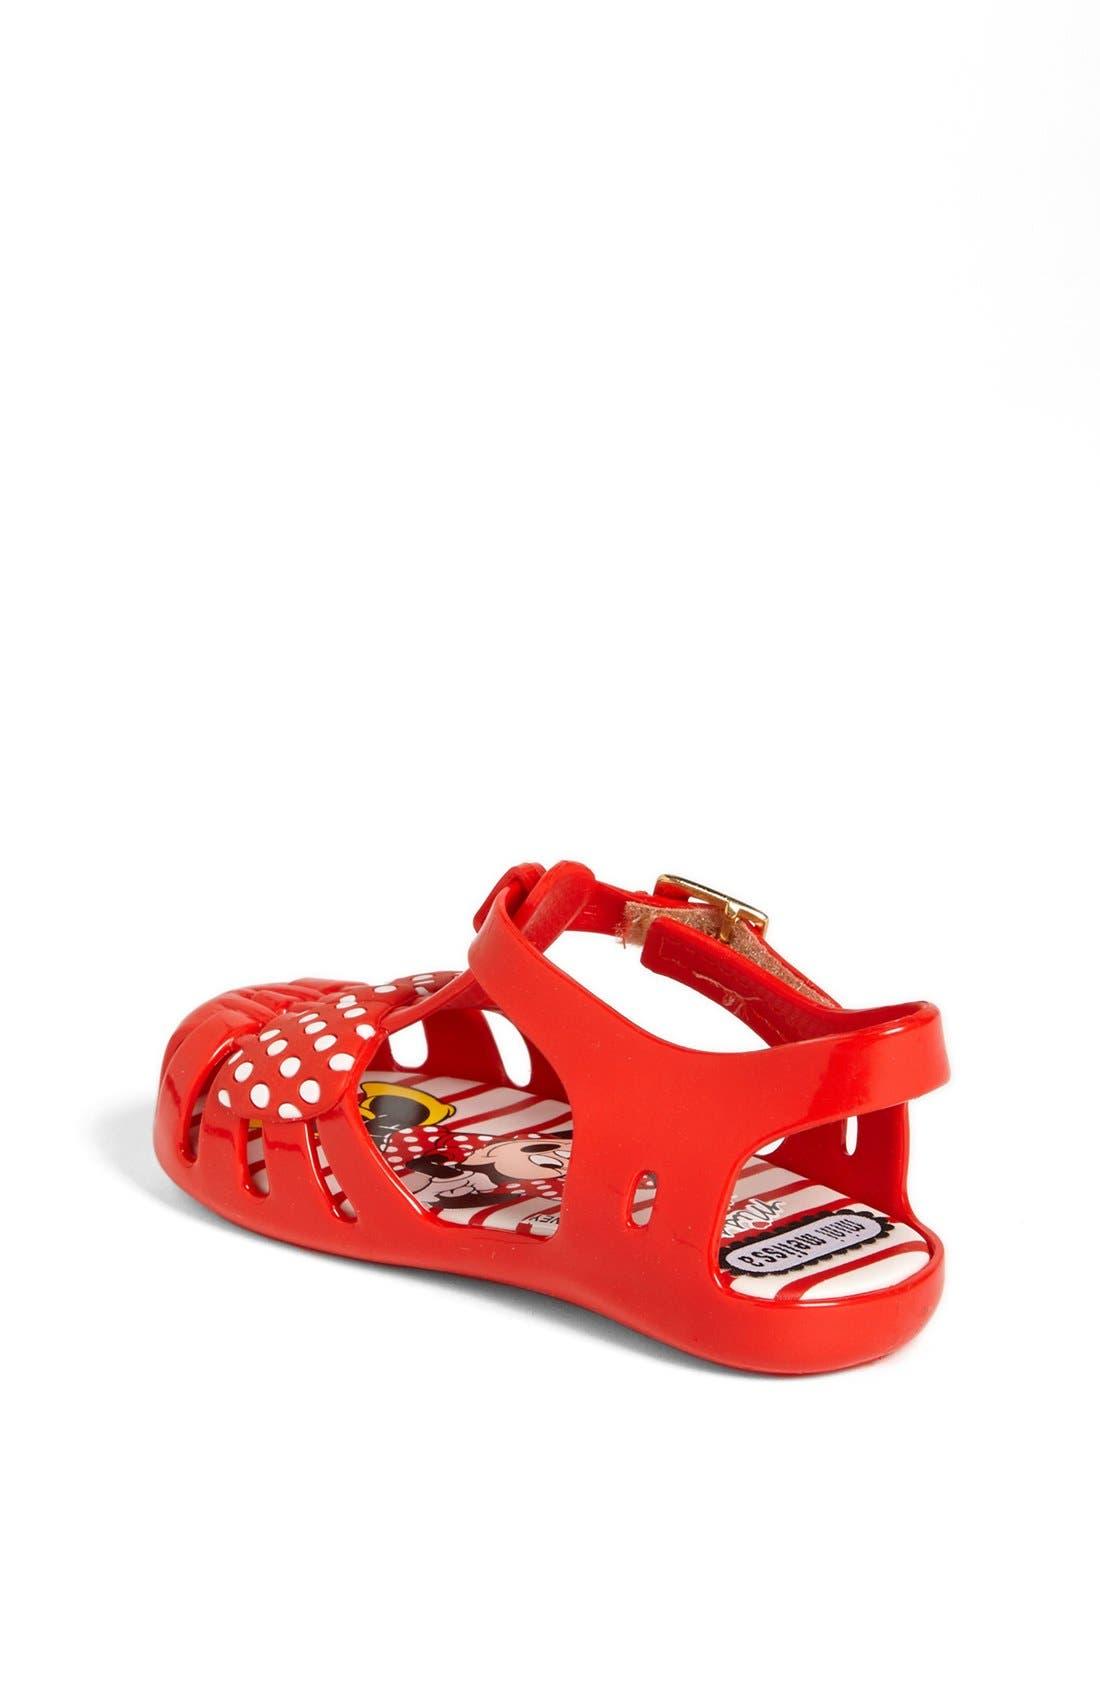 Alternate Image 2  - Mini Melissa 'Aranha - Minnie Mouse®' Sandal (Walker & Toddler)